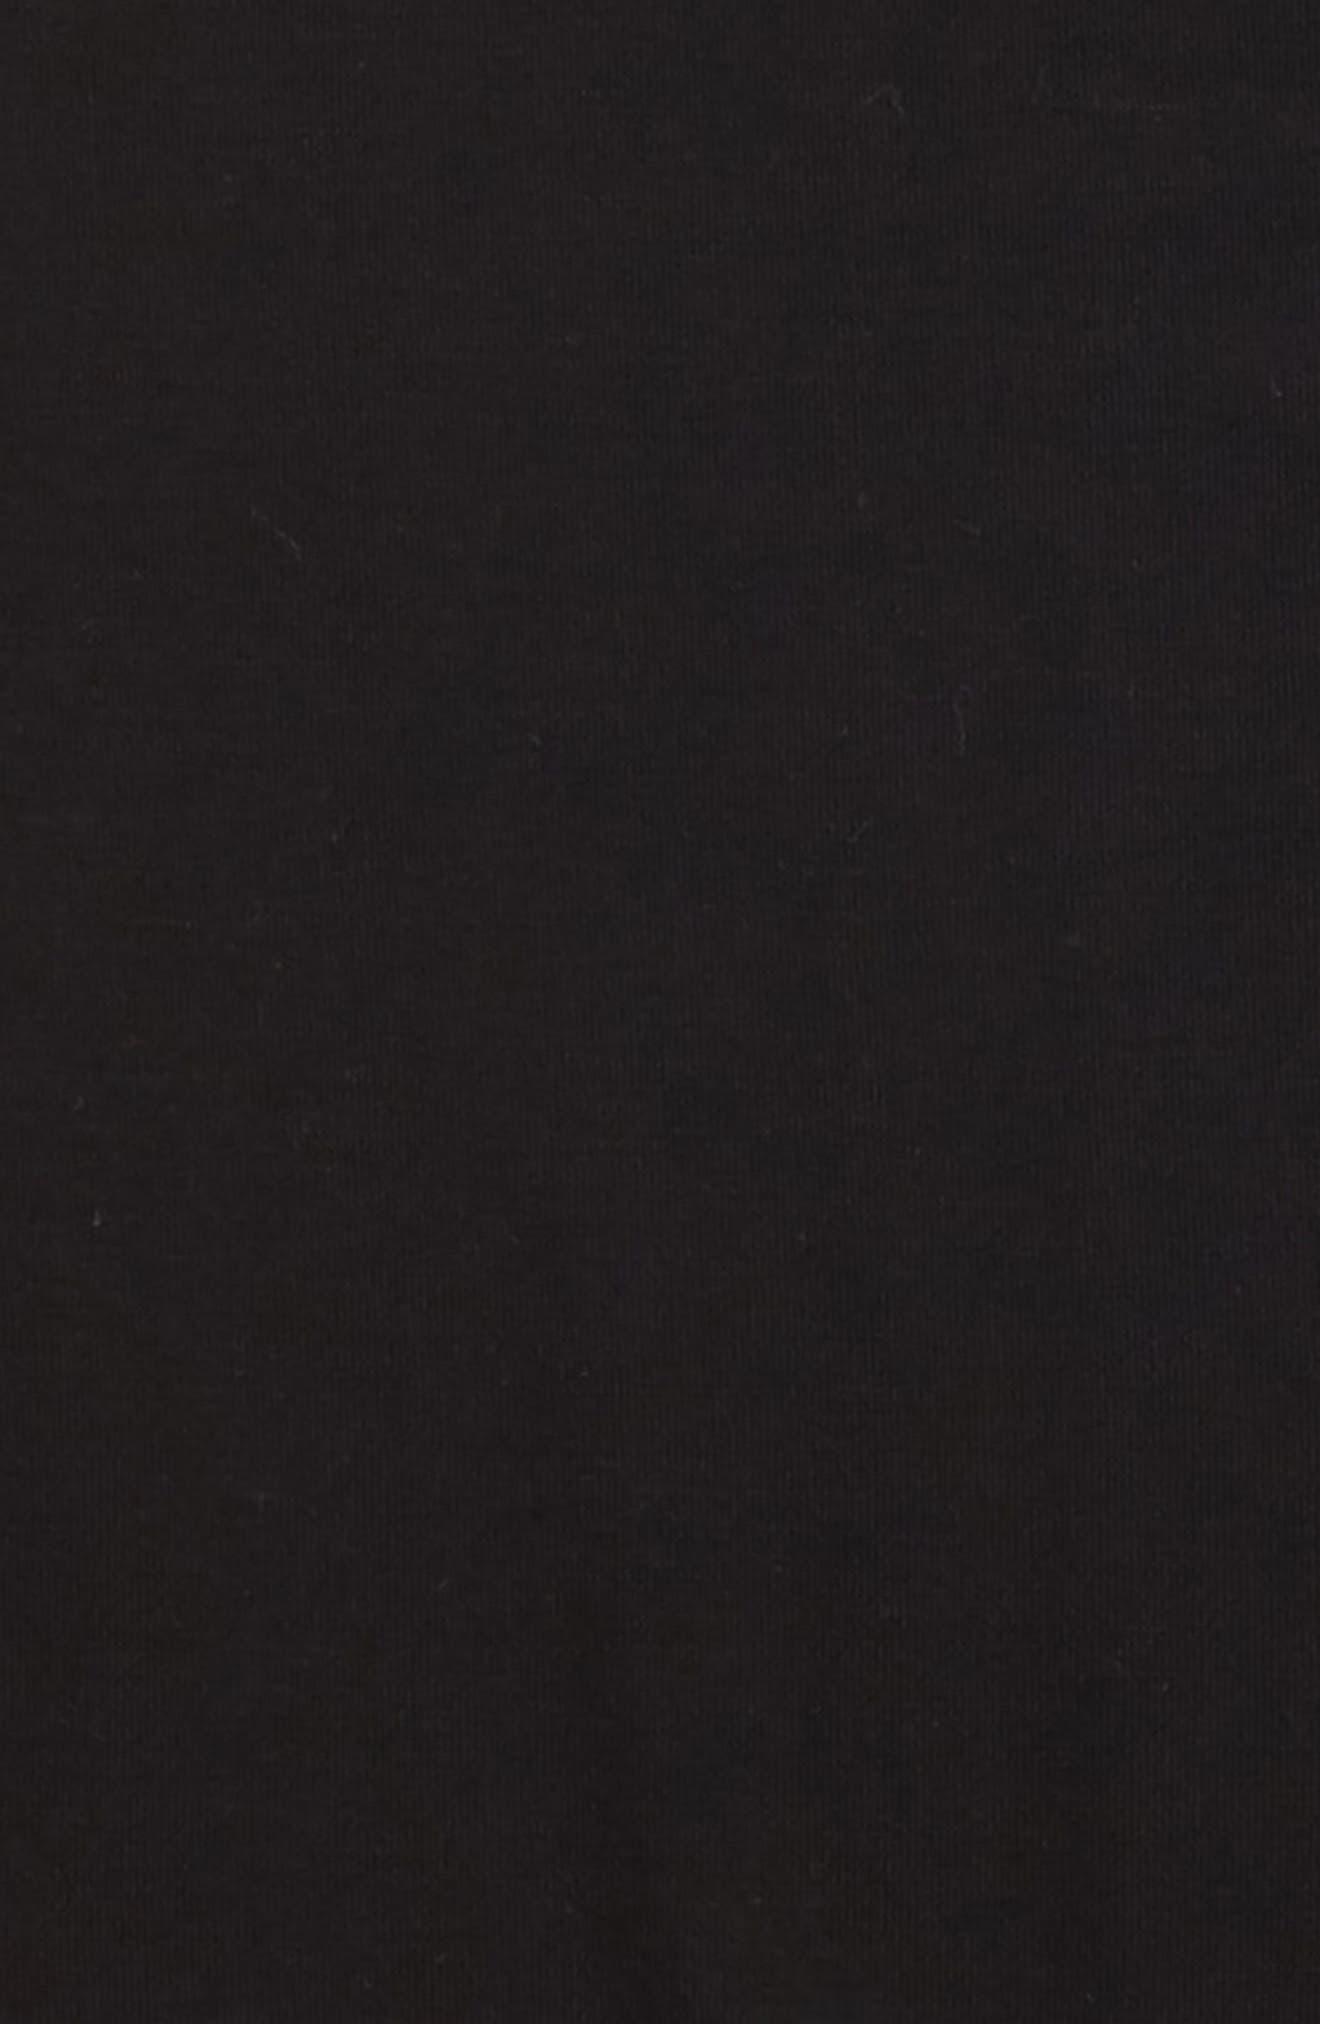 Side Peplum Tank,                             Alternate thumbnail 2, color,                             Black